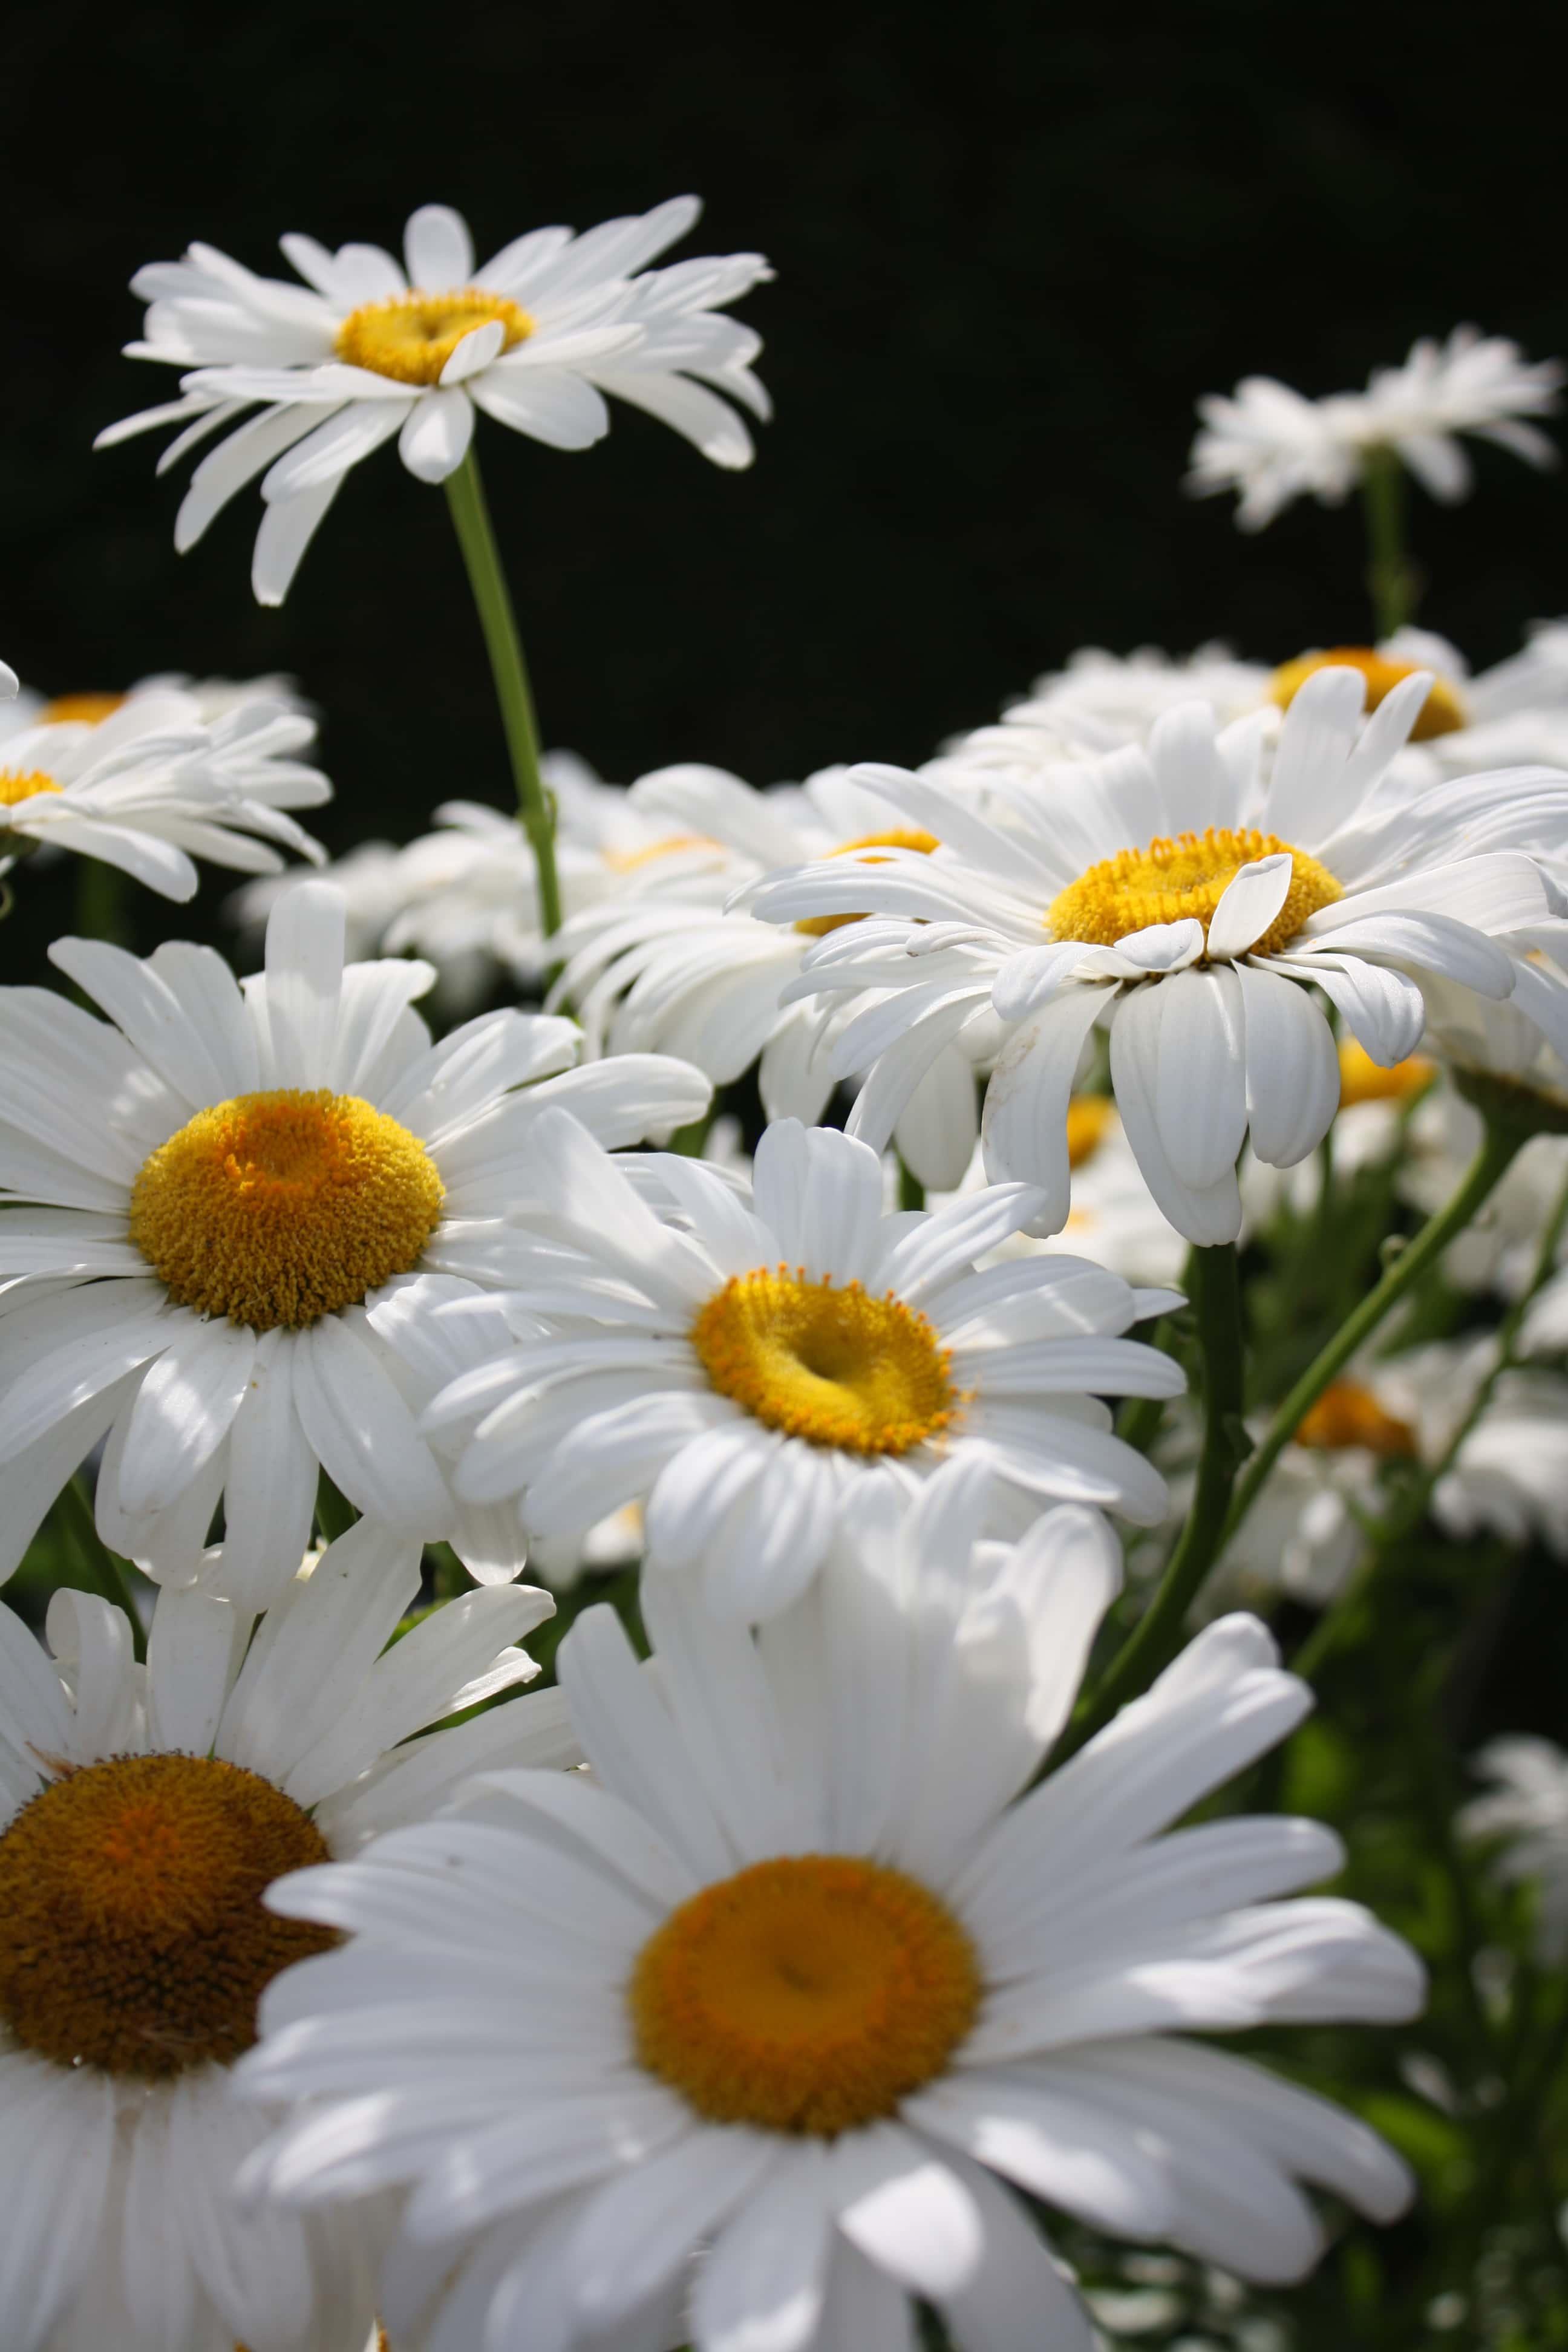 FREE PICTURE FLOWER GARDEN MARGARITA MEADOW PLANT FLORA NATURE